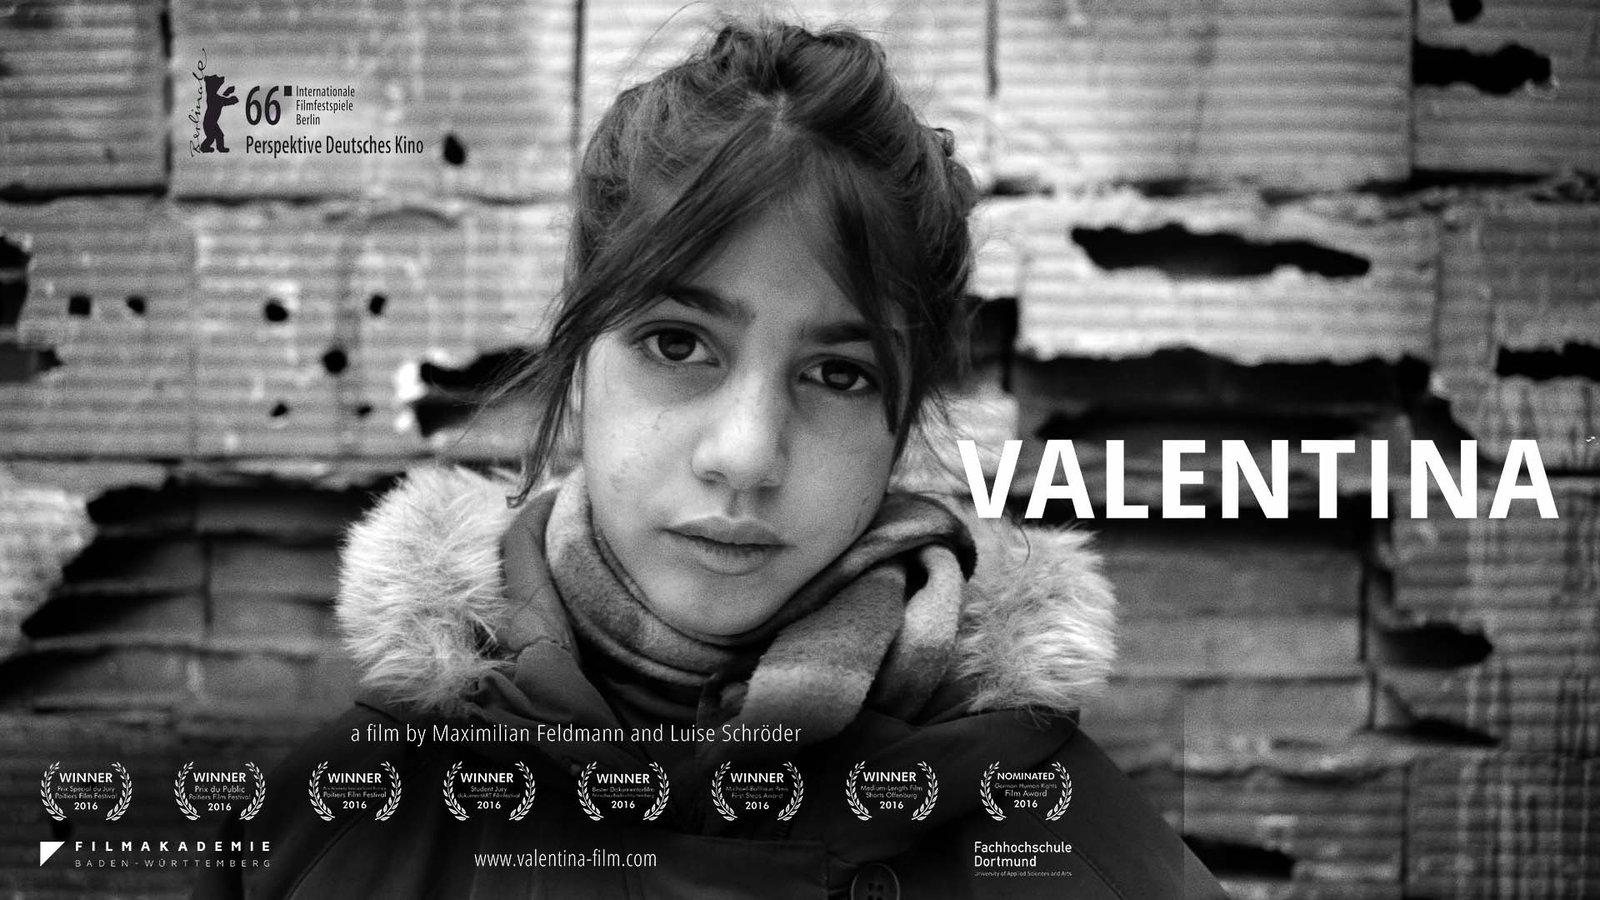 Valentina - Life in a Roma Neighborhood in Macedonia